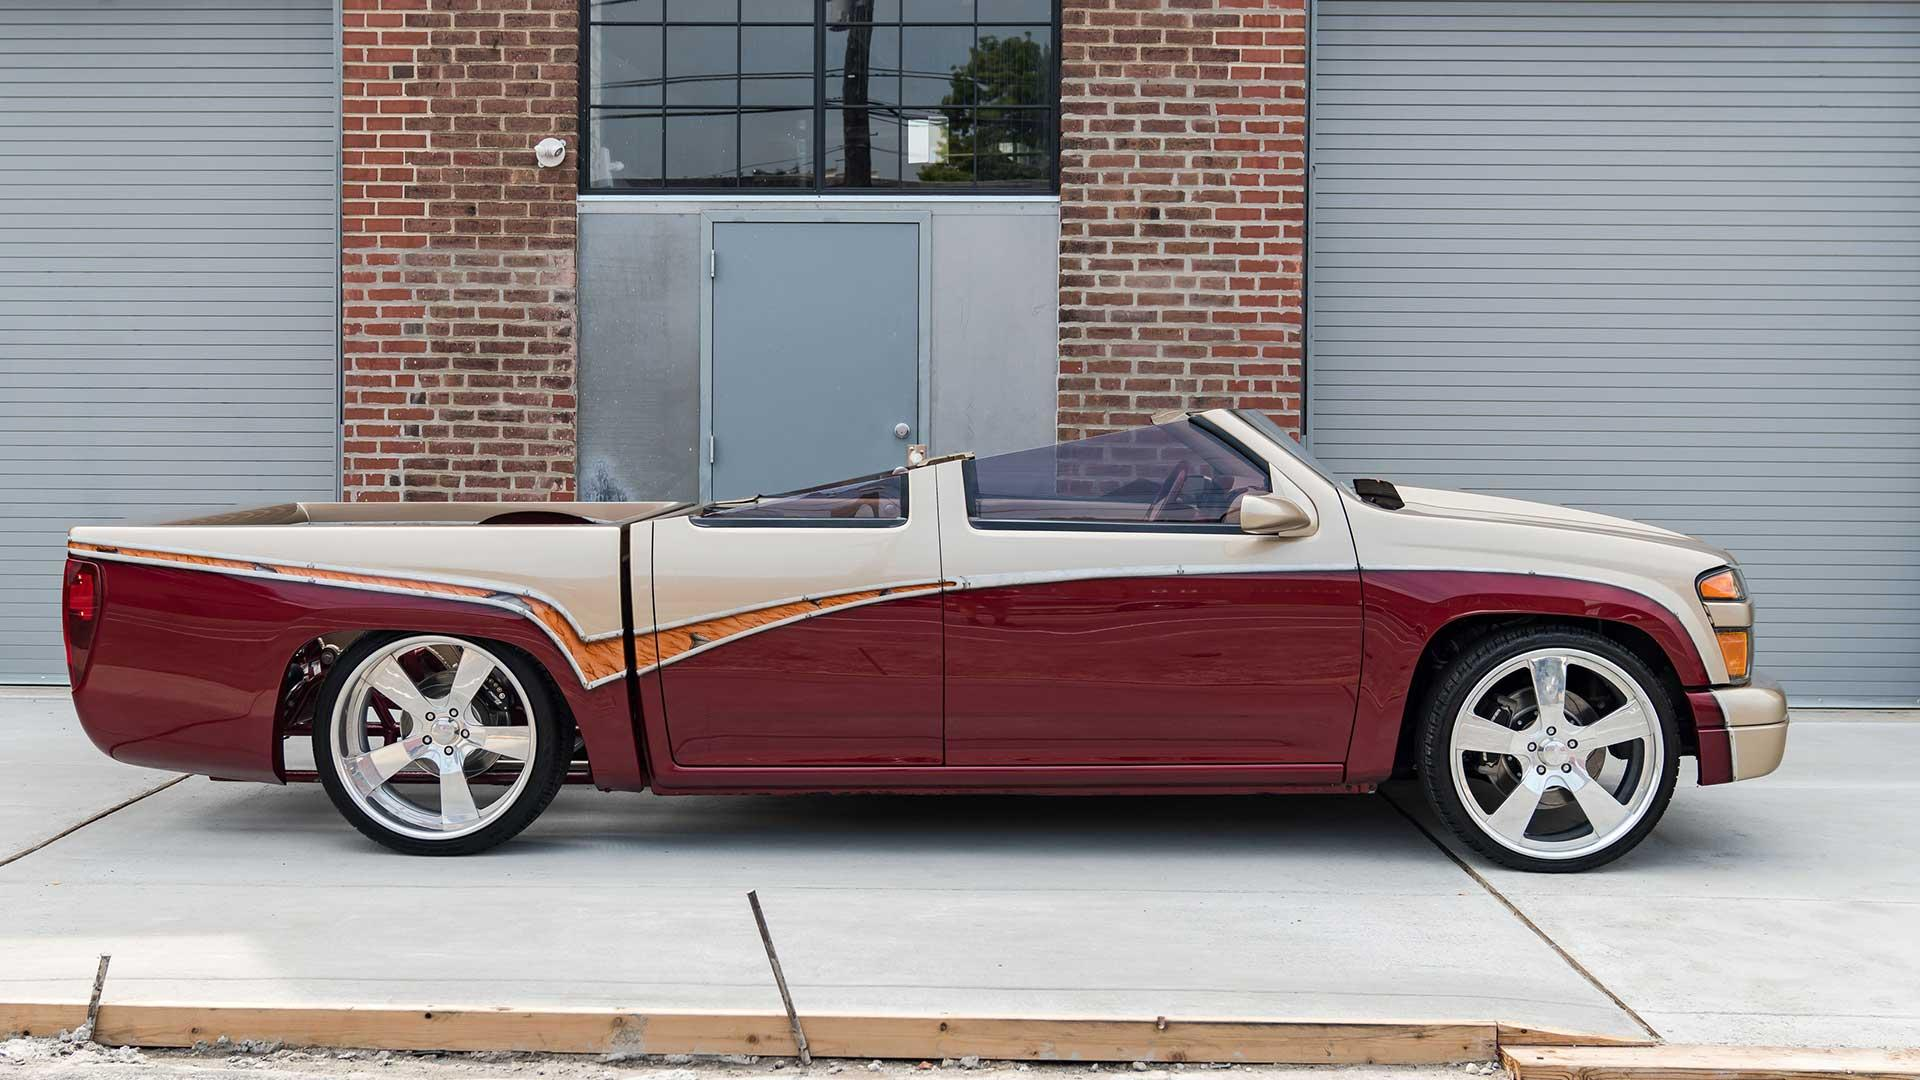 Zijkant Chevrolet Colorado Custom (Cool Cars Engineering)